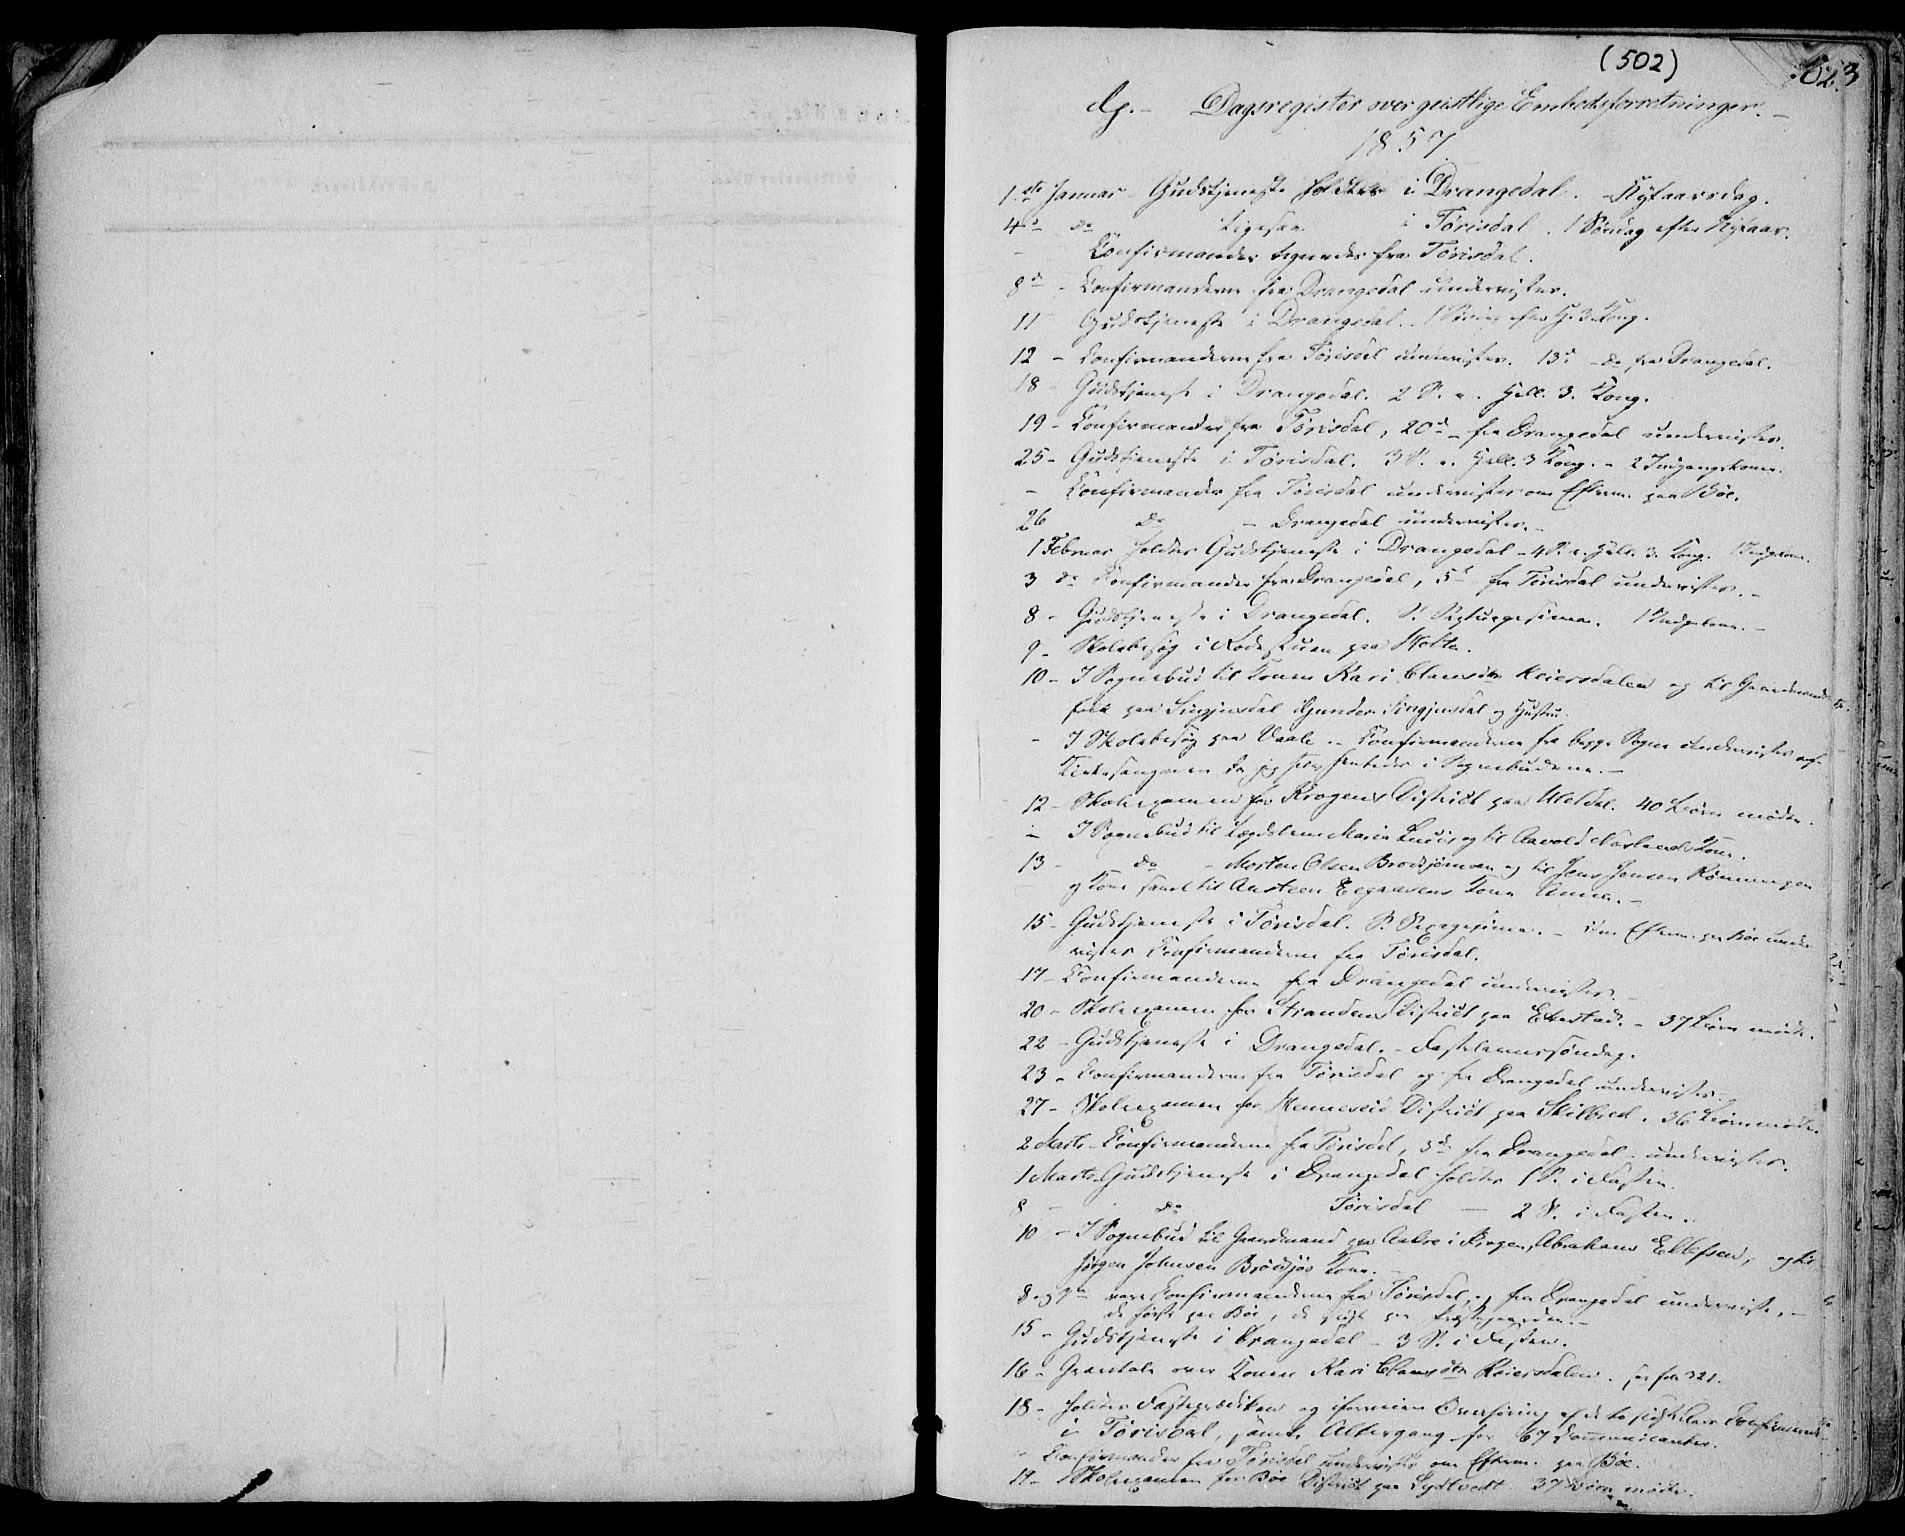 SAKO, Drangedal kirkebøker, F/Fa/L0008: Ministerialbok nr. 8, 1857-1871, s. 502